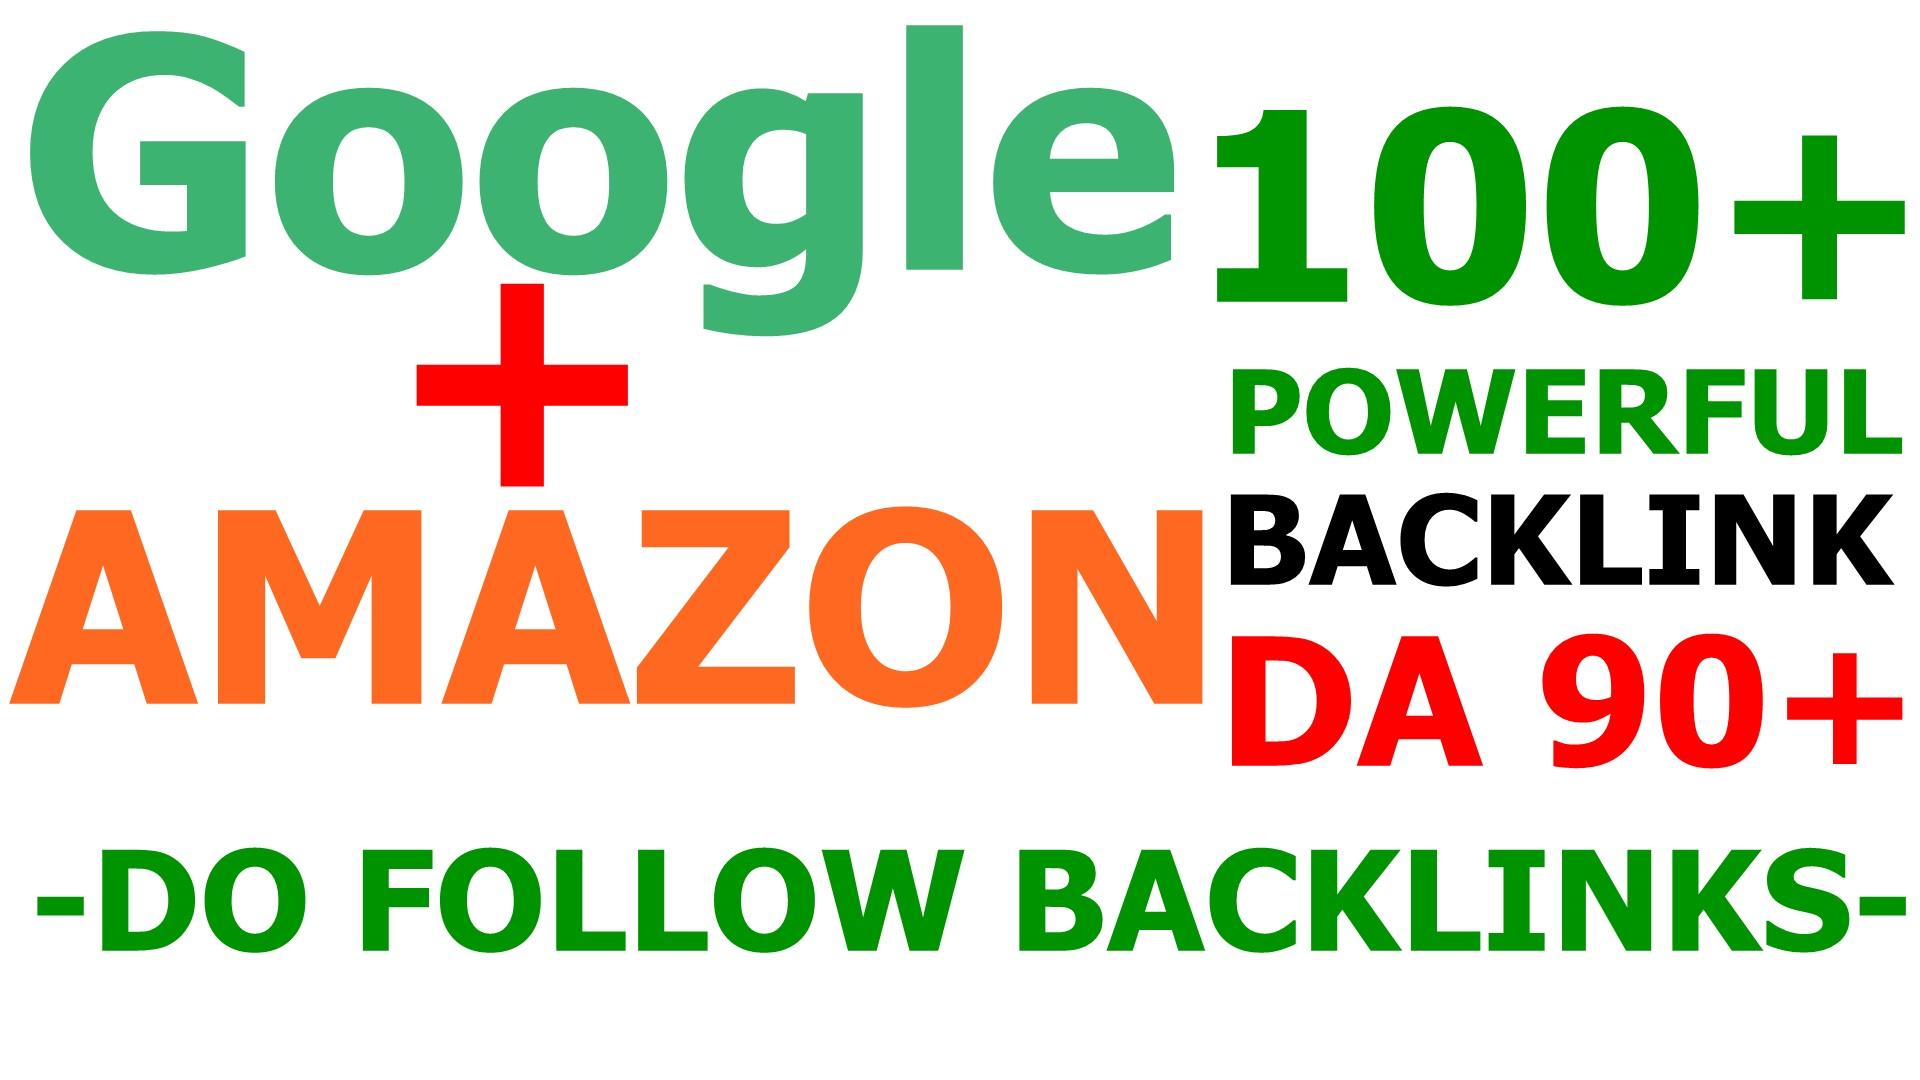 Google And Amazon 100 Premium Dofollow SEO Powerful Backlinks